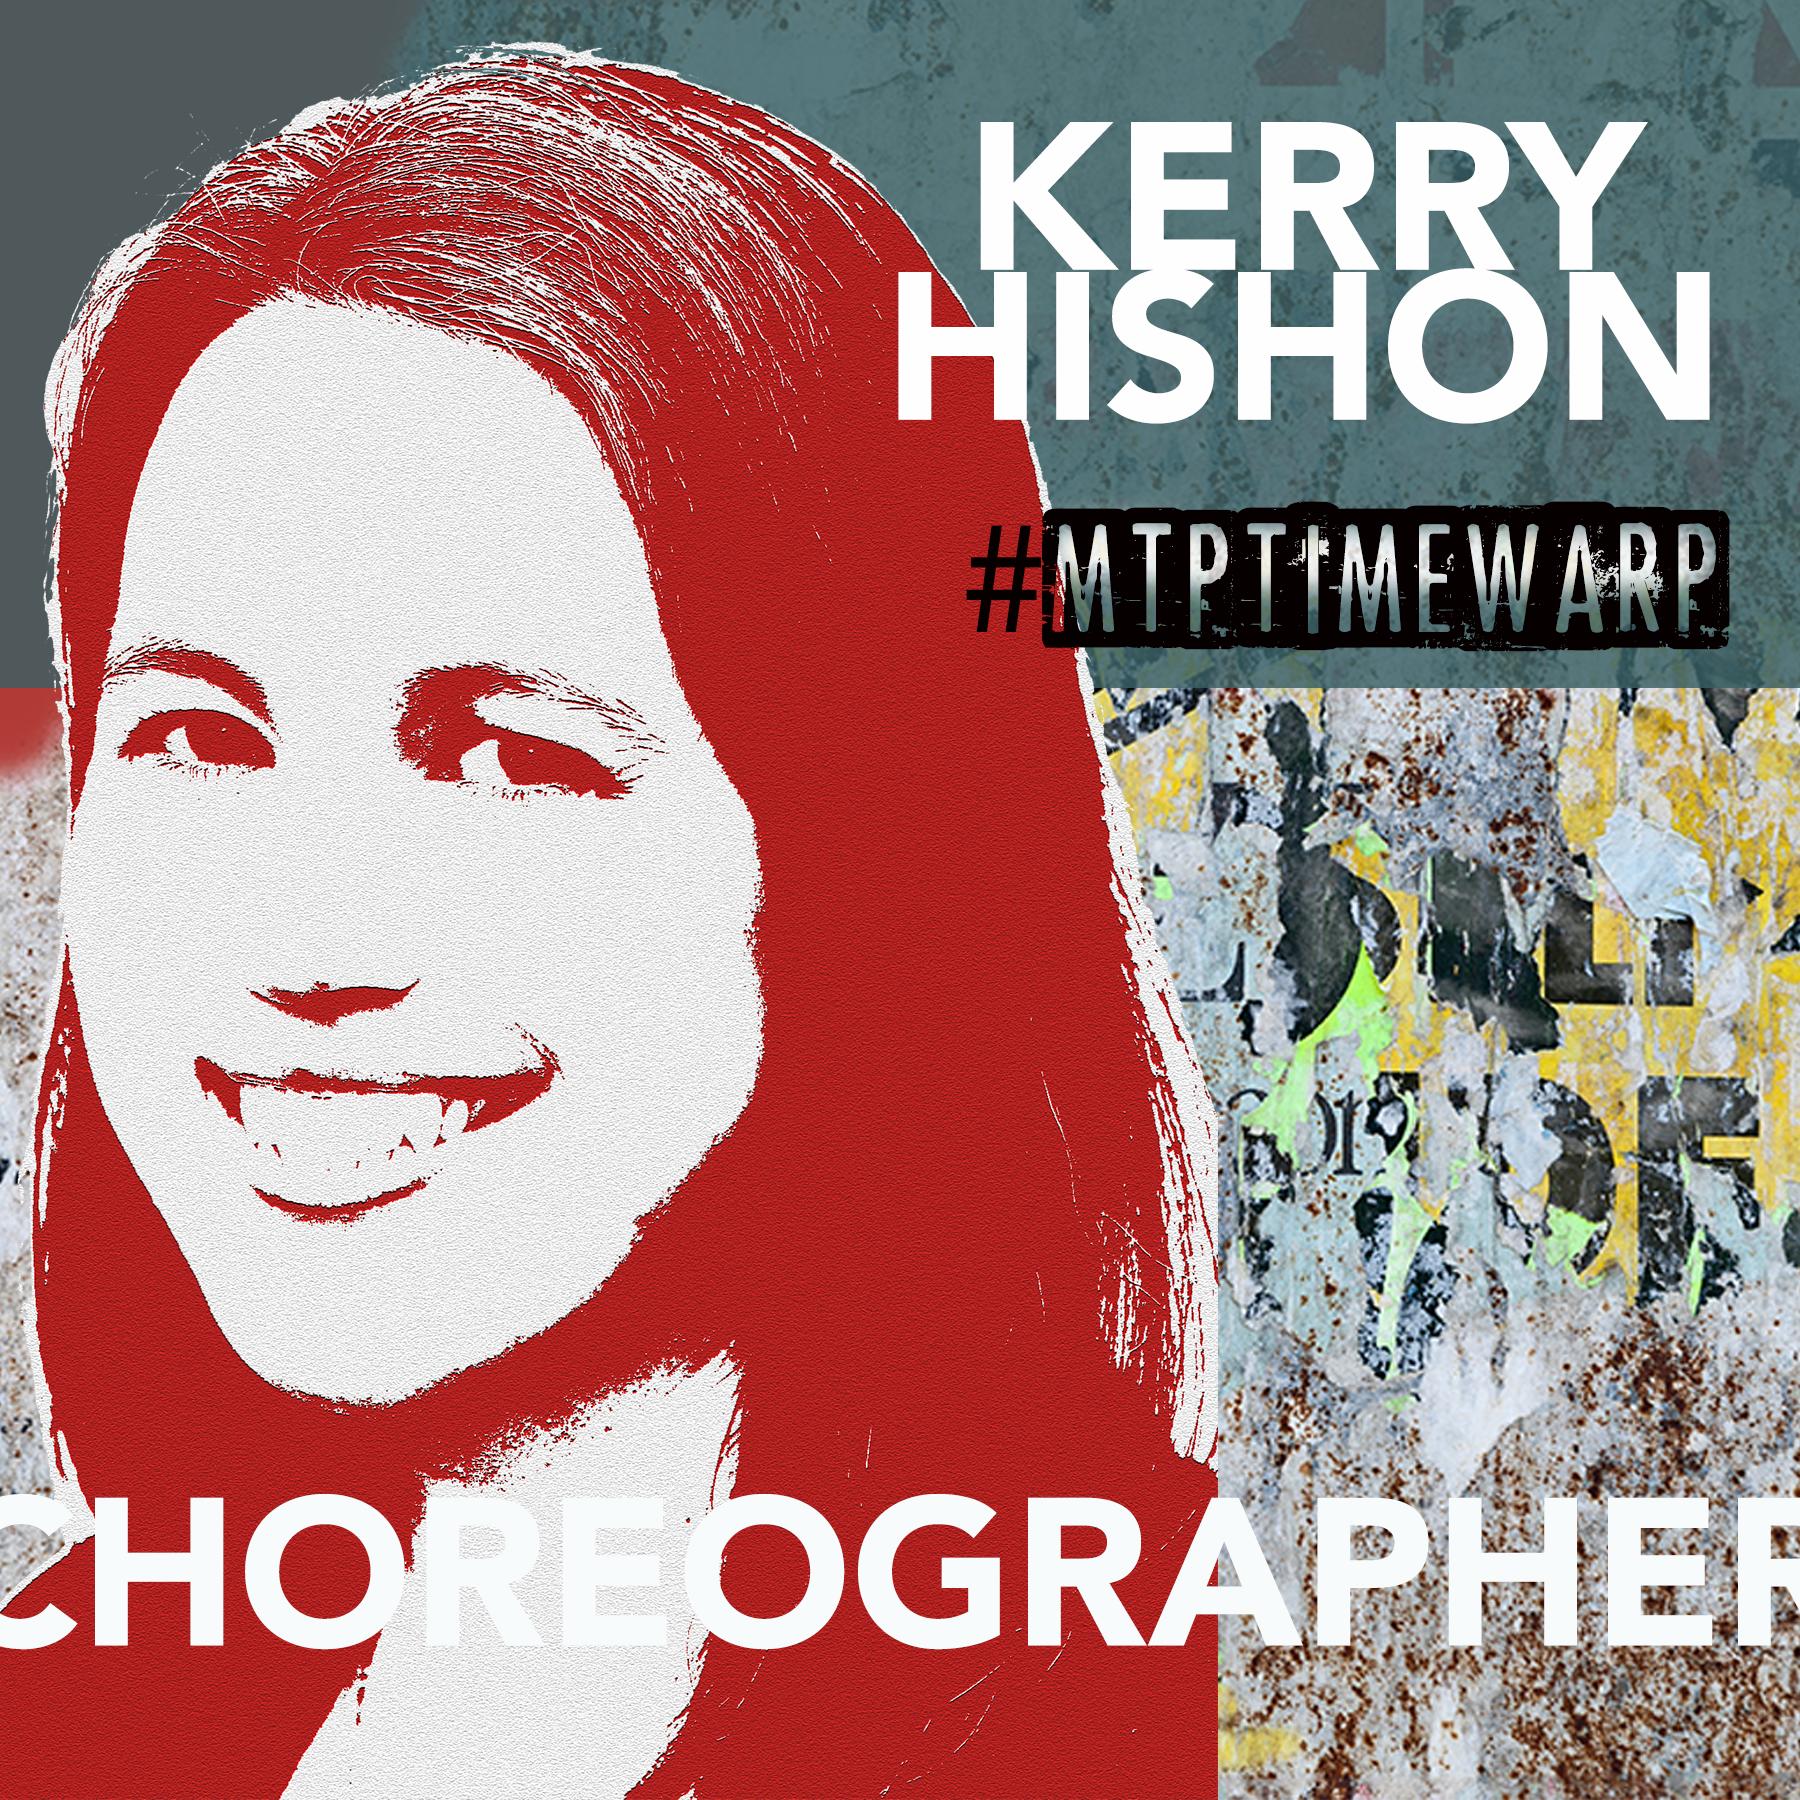 Kerry Hishon Headshot.png